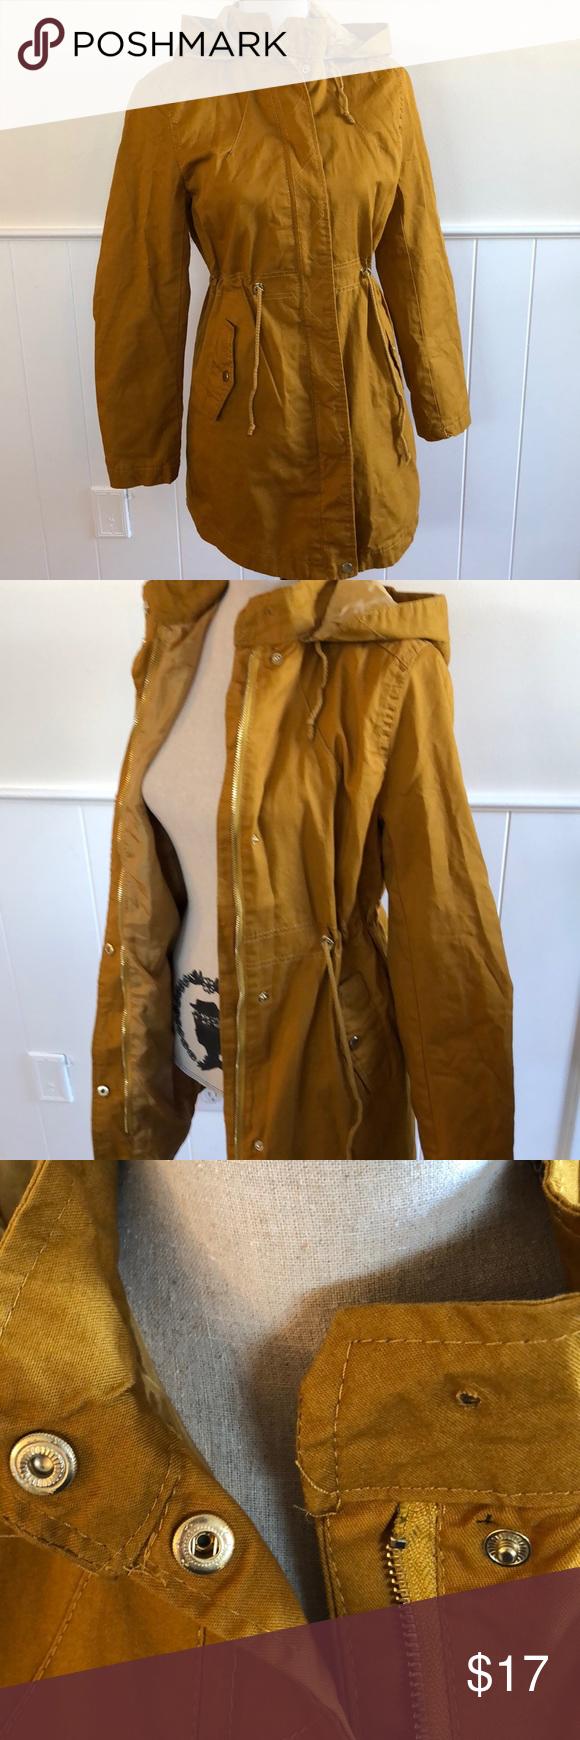 Nwt Forever 21 Golden Yellow Utility Jacket Jackets Cotton Jacket Forever 21 Jacket [ 1740 x 580 Pixel ]